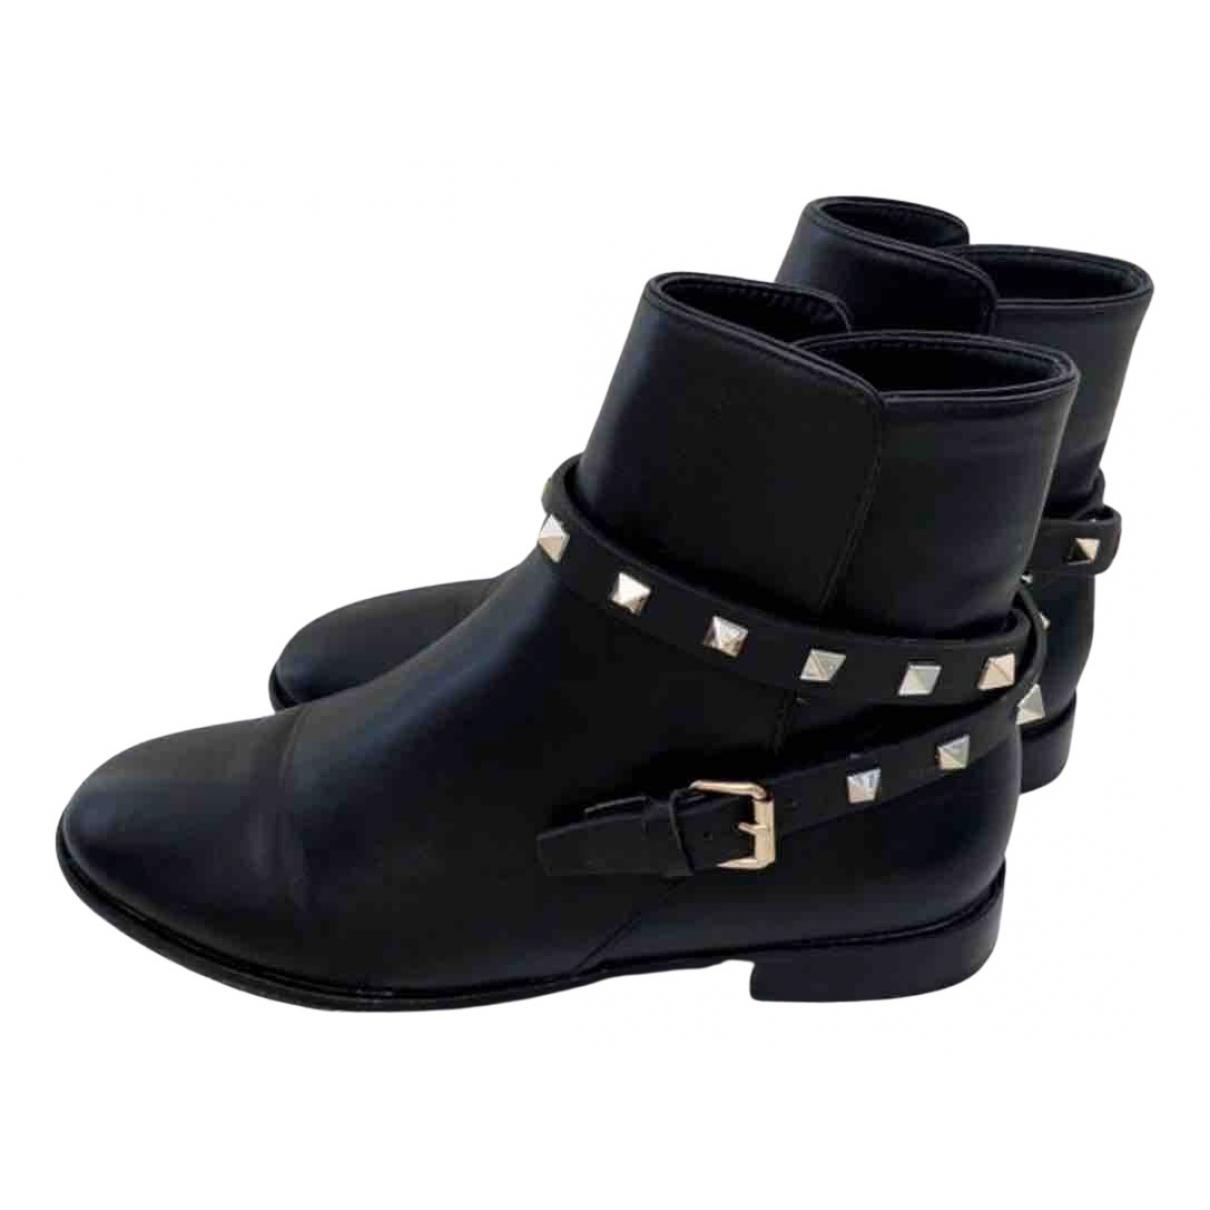 Valentino Garavani Rockstud Black Leather Ankle boots for Women 38 EU